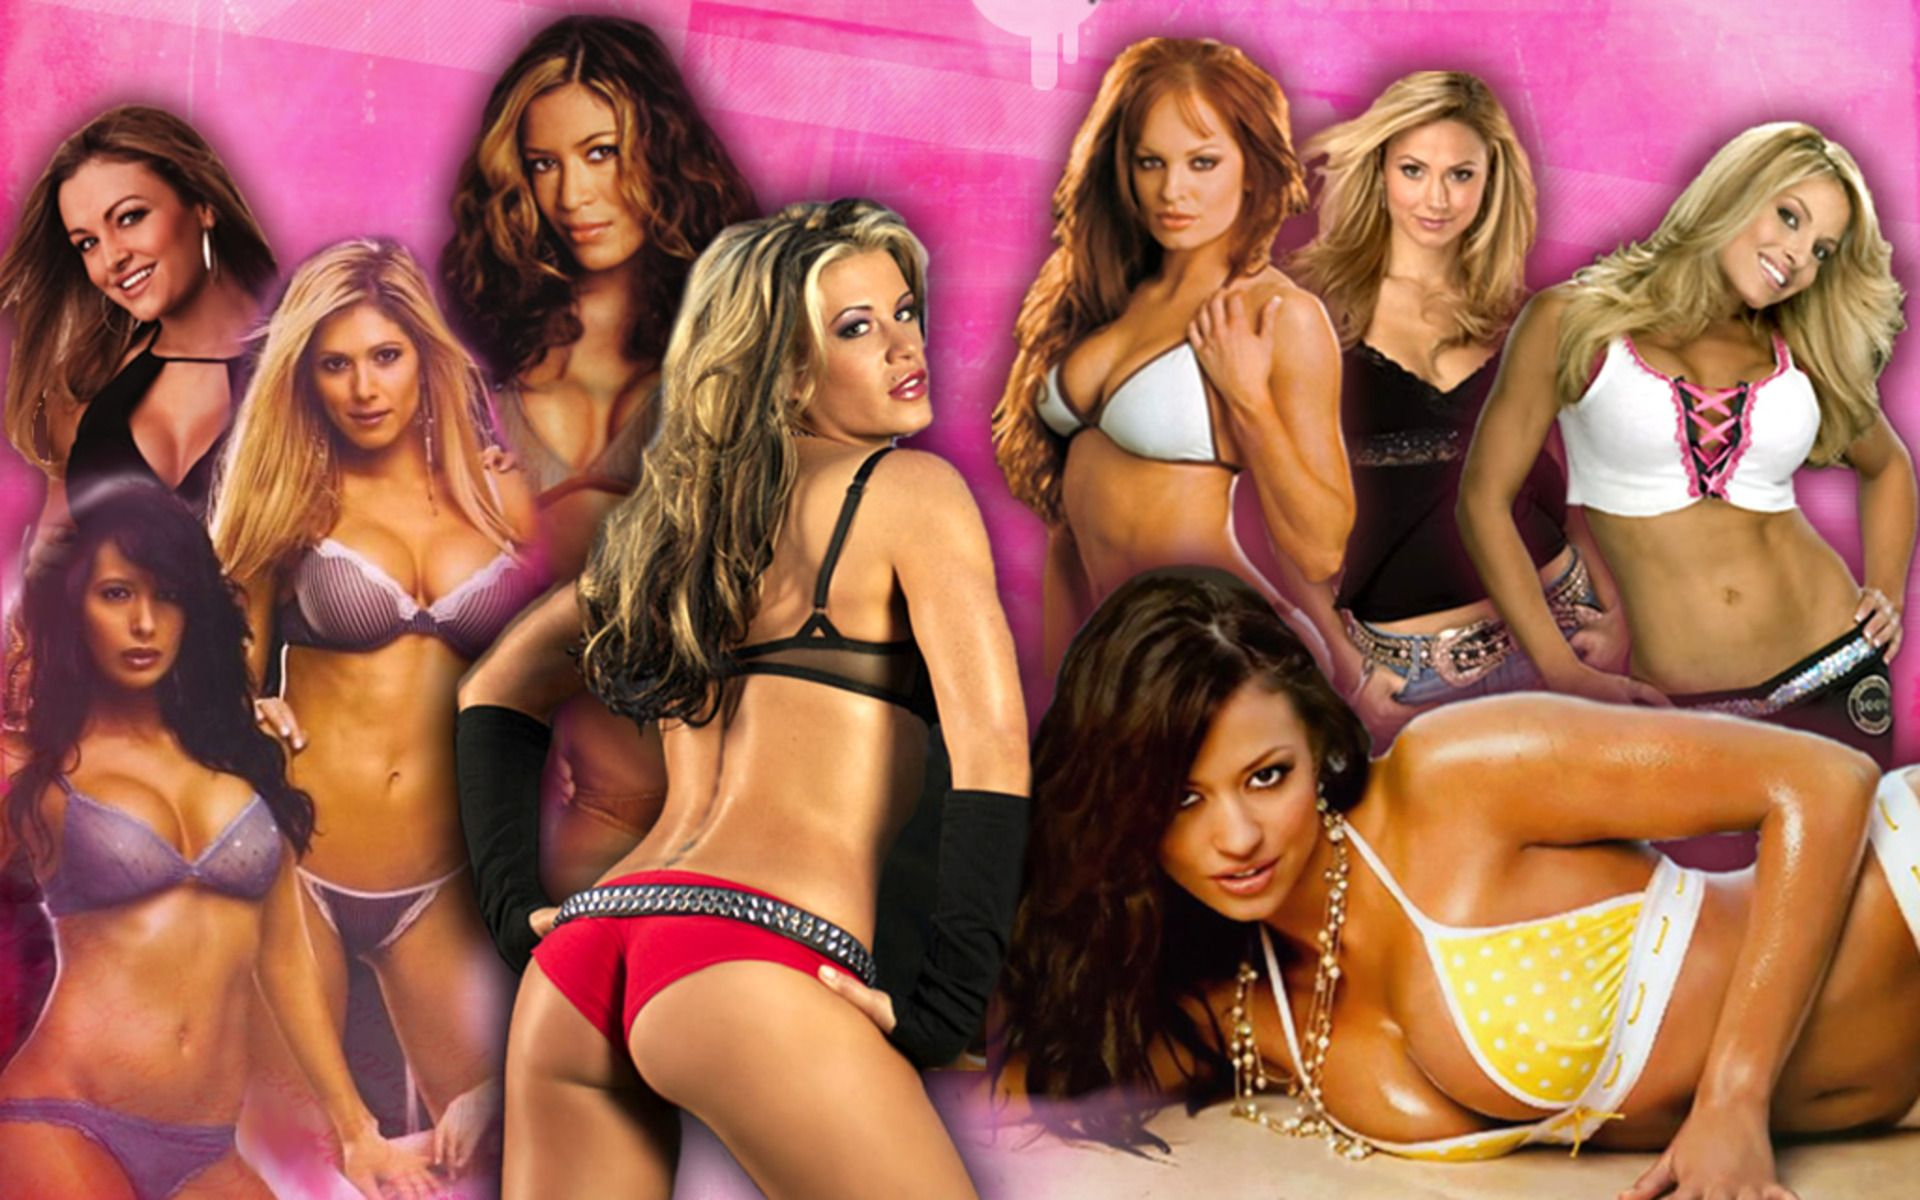 Sexy Pics Of Wwe Divas 119